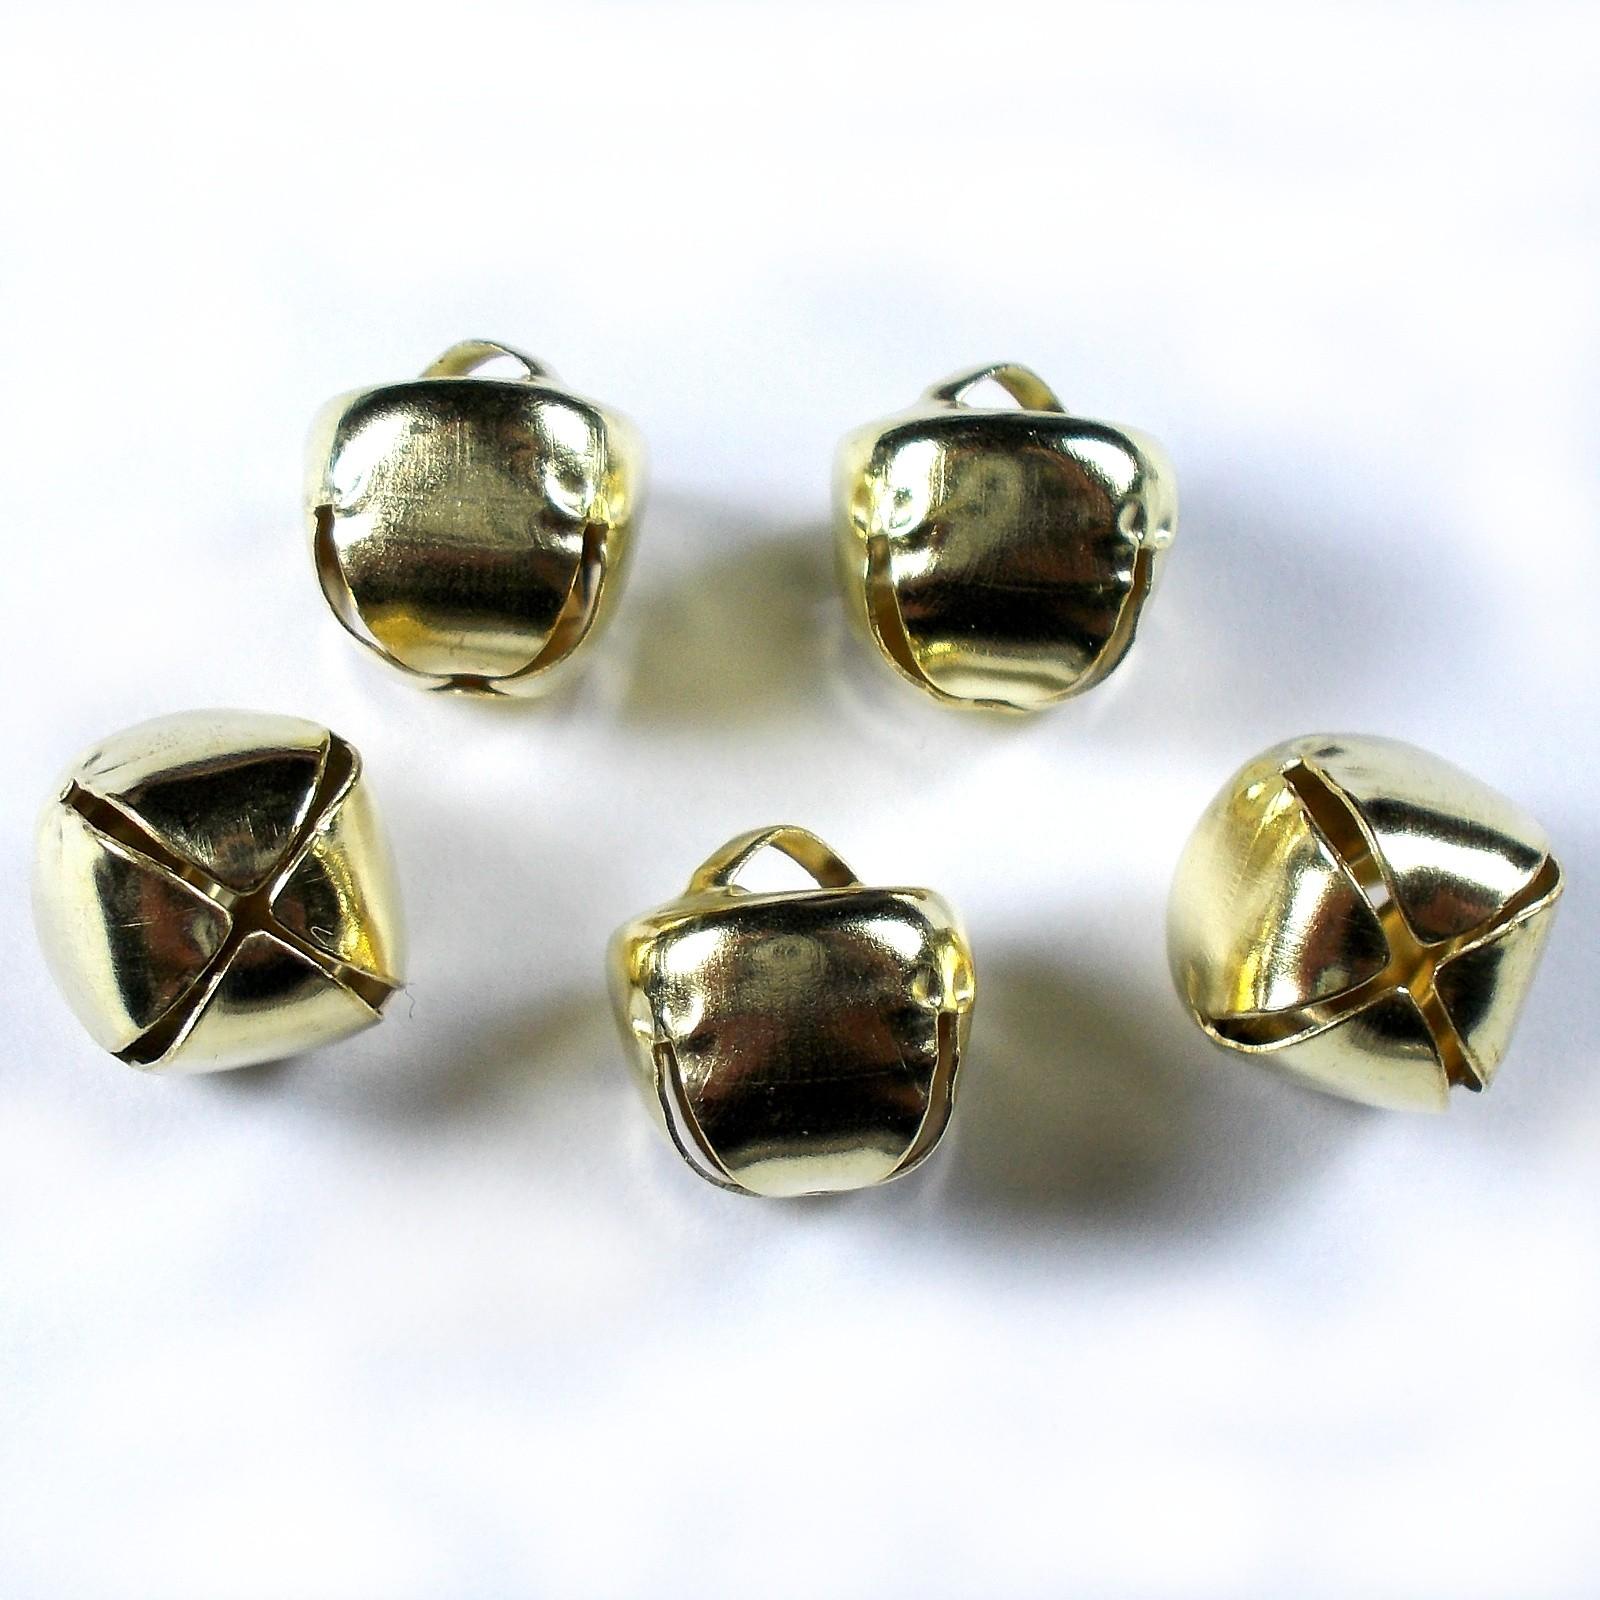 Cat Bells Sleigh Jingle Bells 10mm Gold Pack of 5